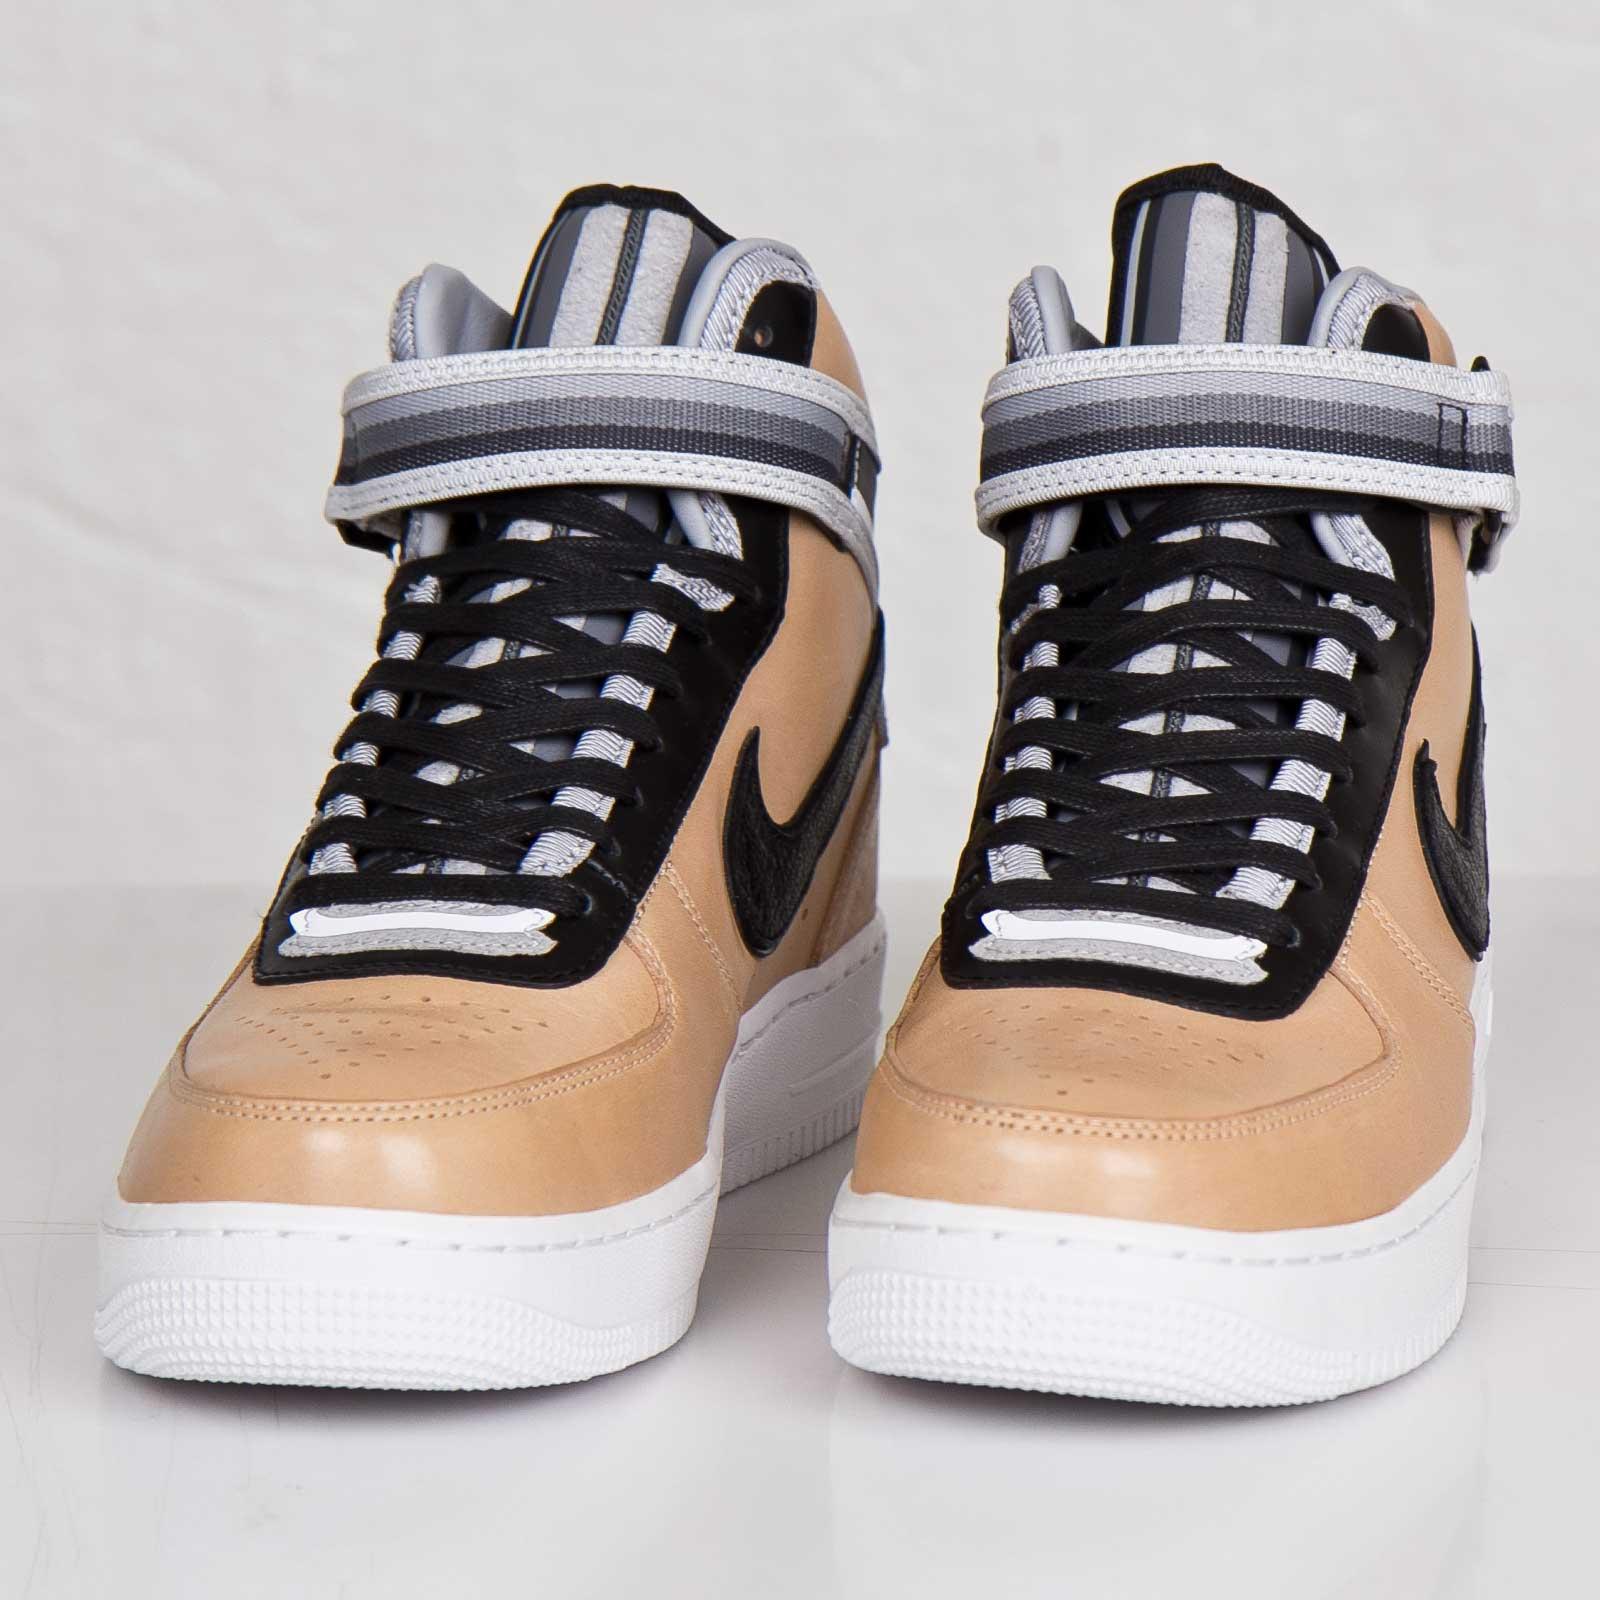 online store 17478 5e235 Nike Air Force 1 Mid SP Tisci - 677130-200 - Sneakersnstuff   sneakers    streetwear online since 1999